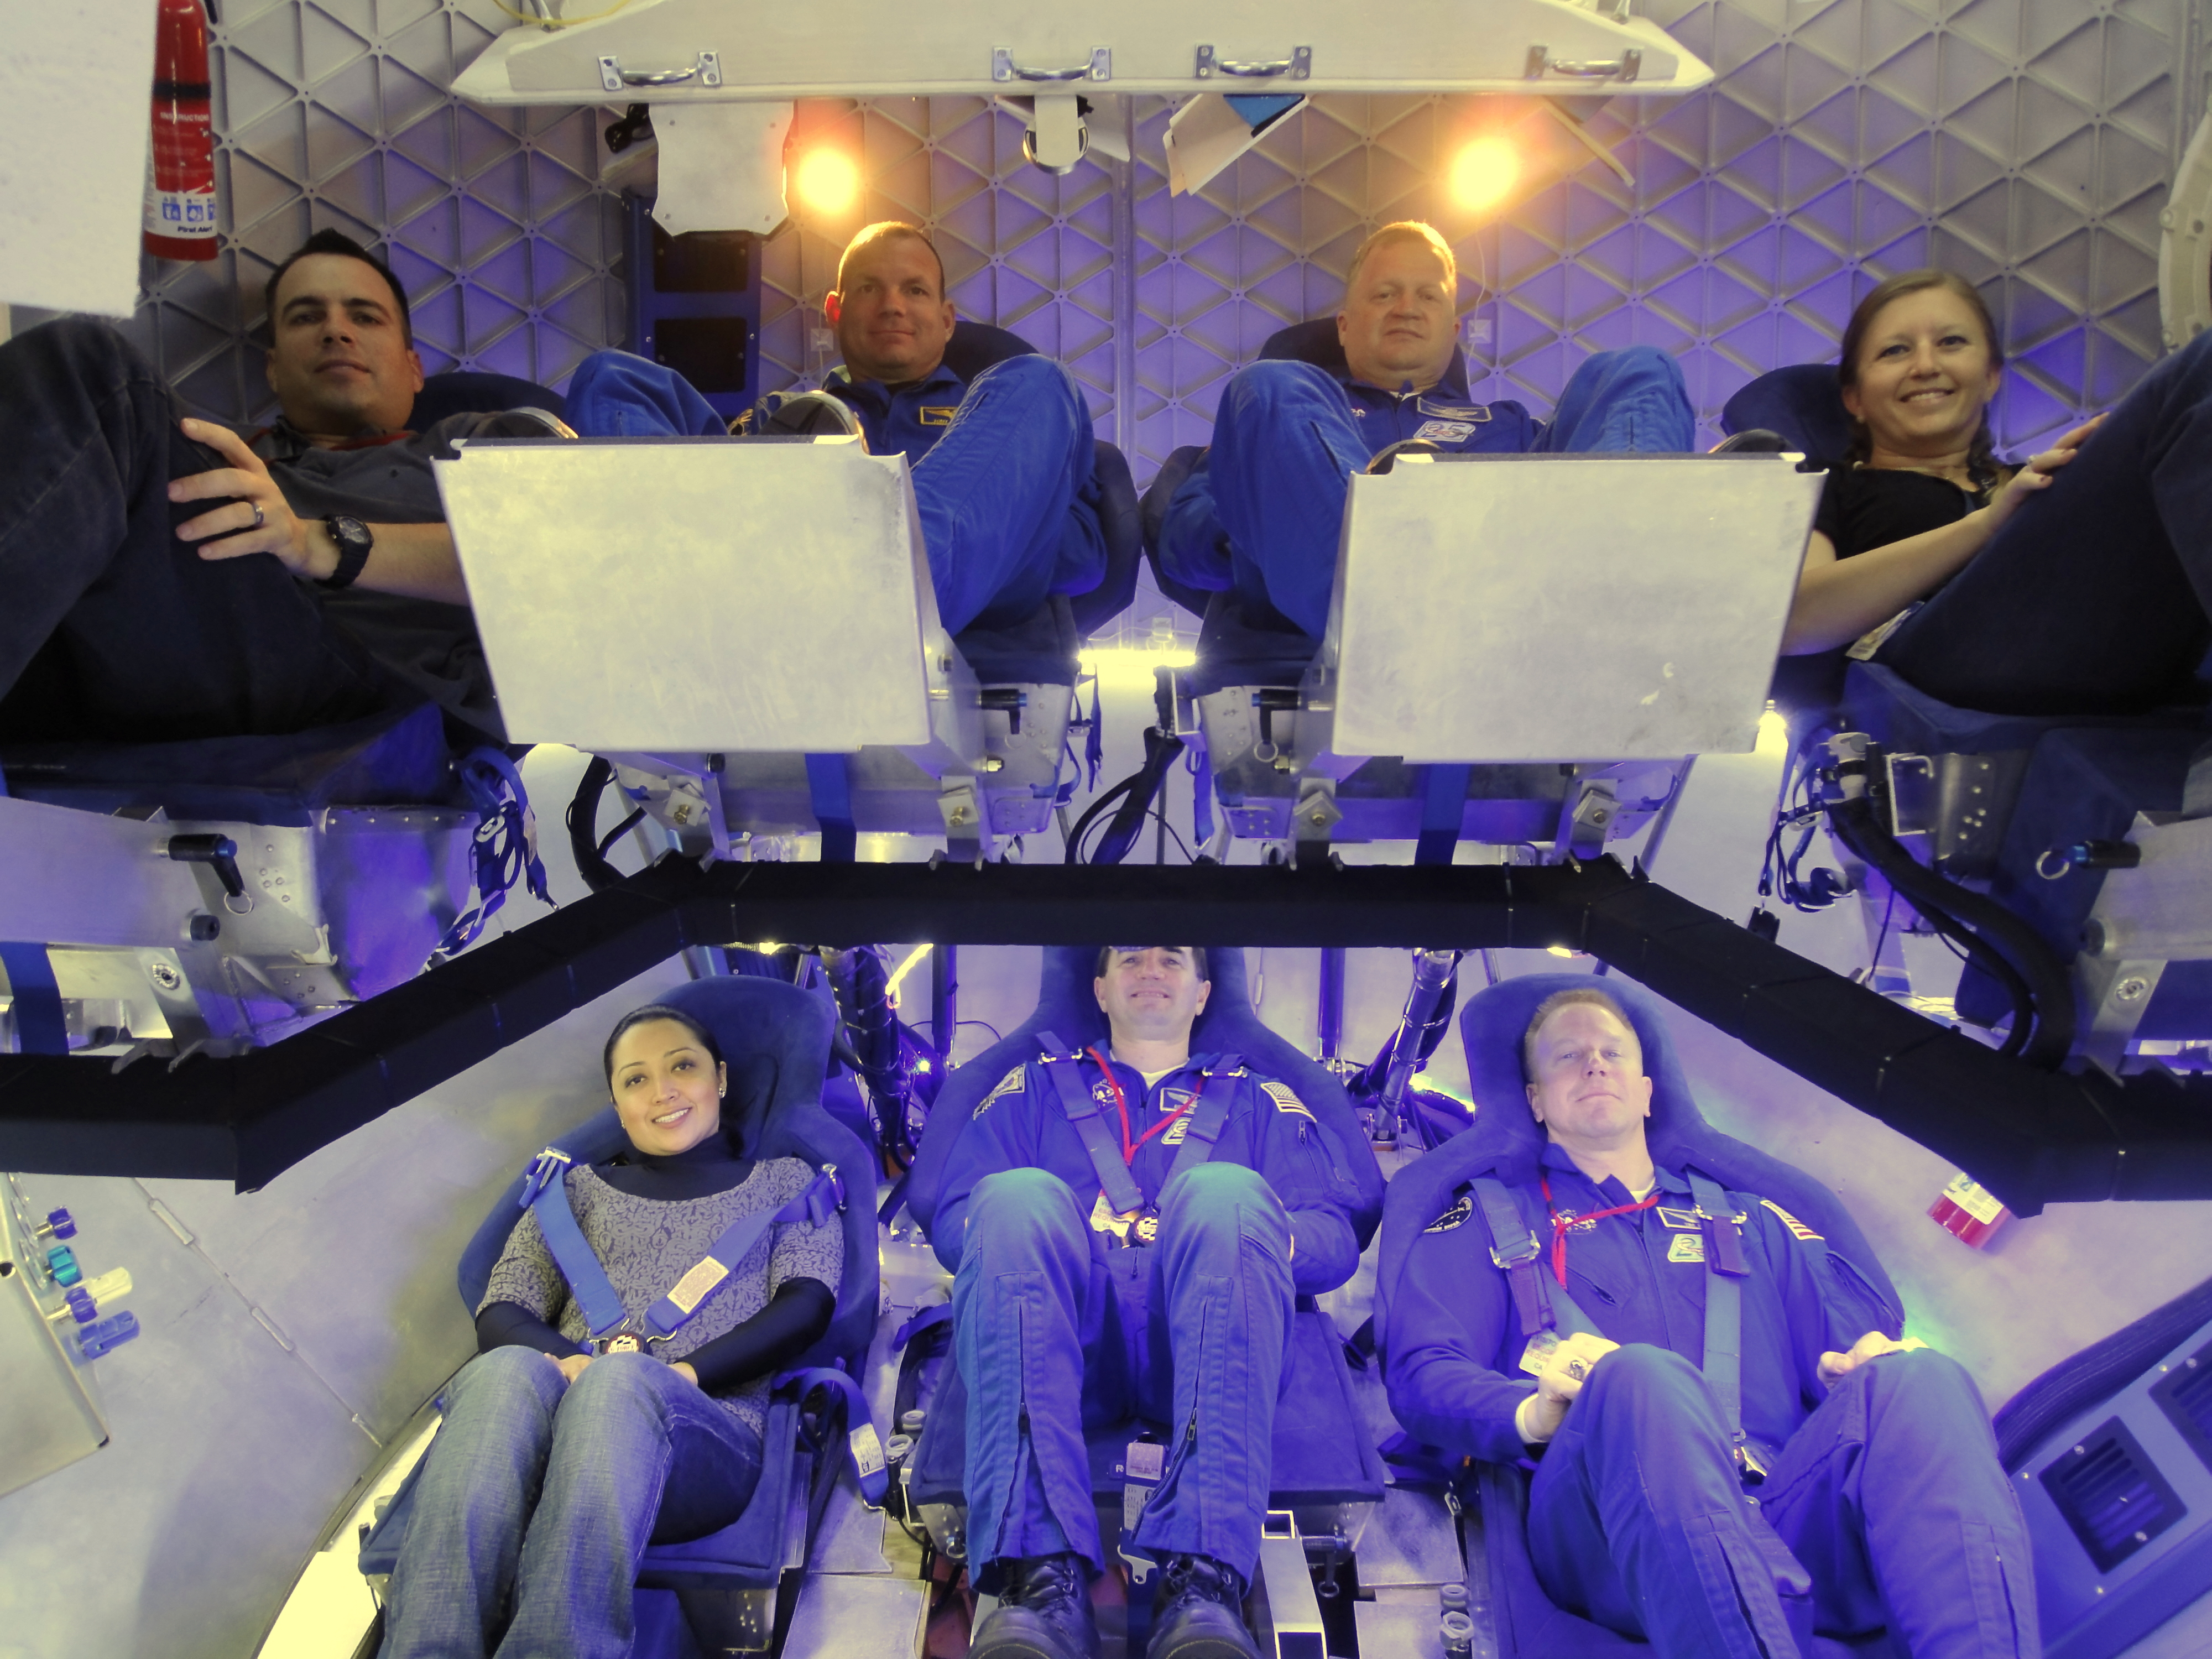 dragon 2 spacecraft interior - photo #20